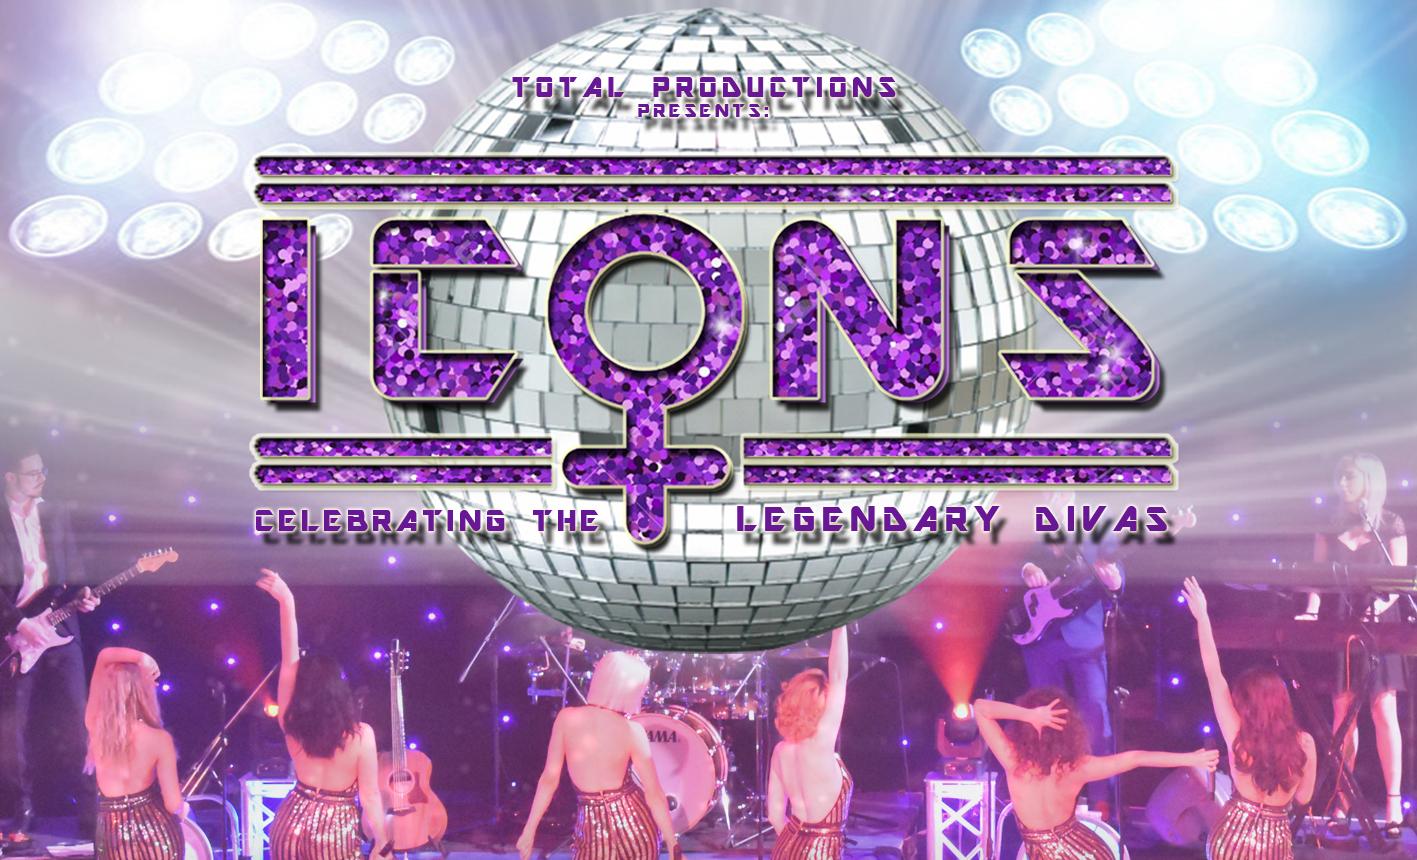 ICONS - Celebrating The Legendary Divas!